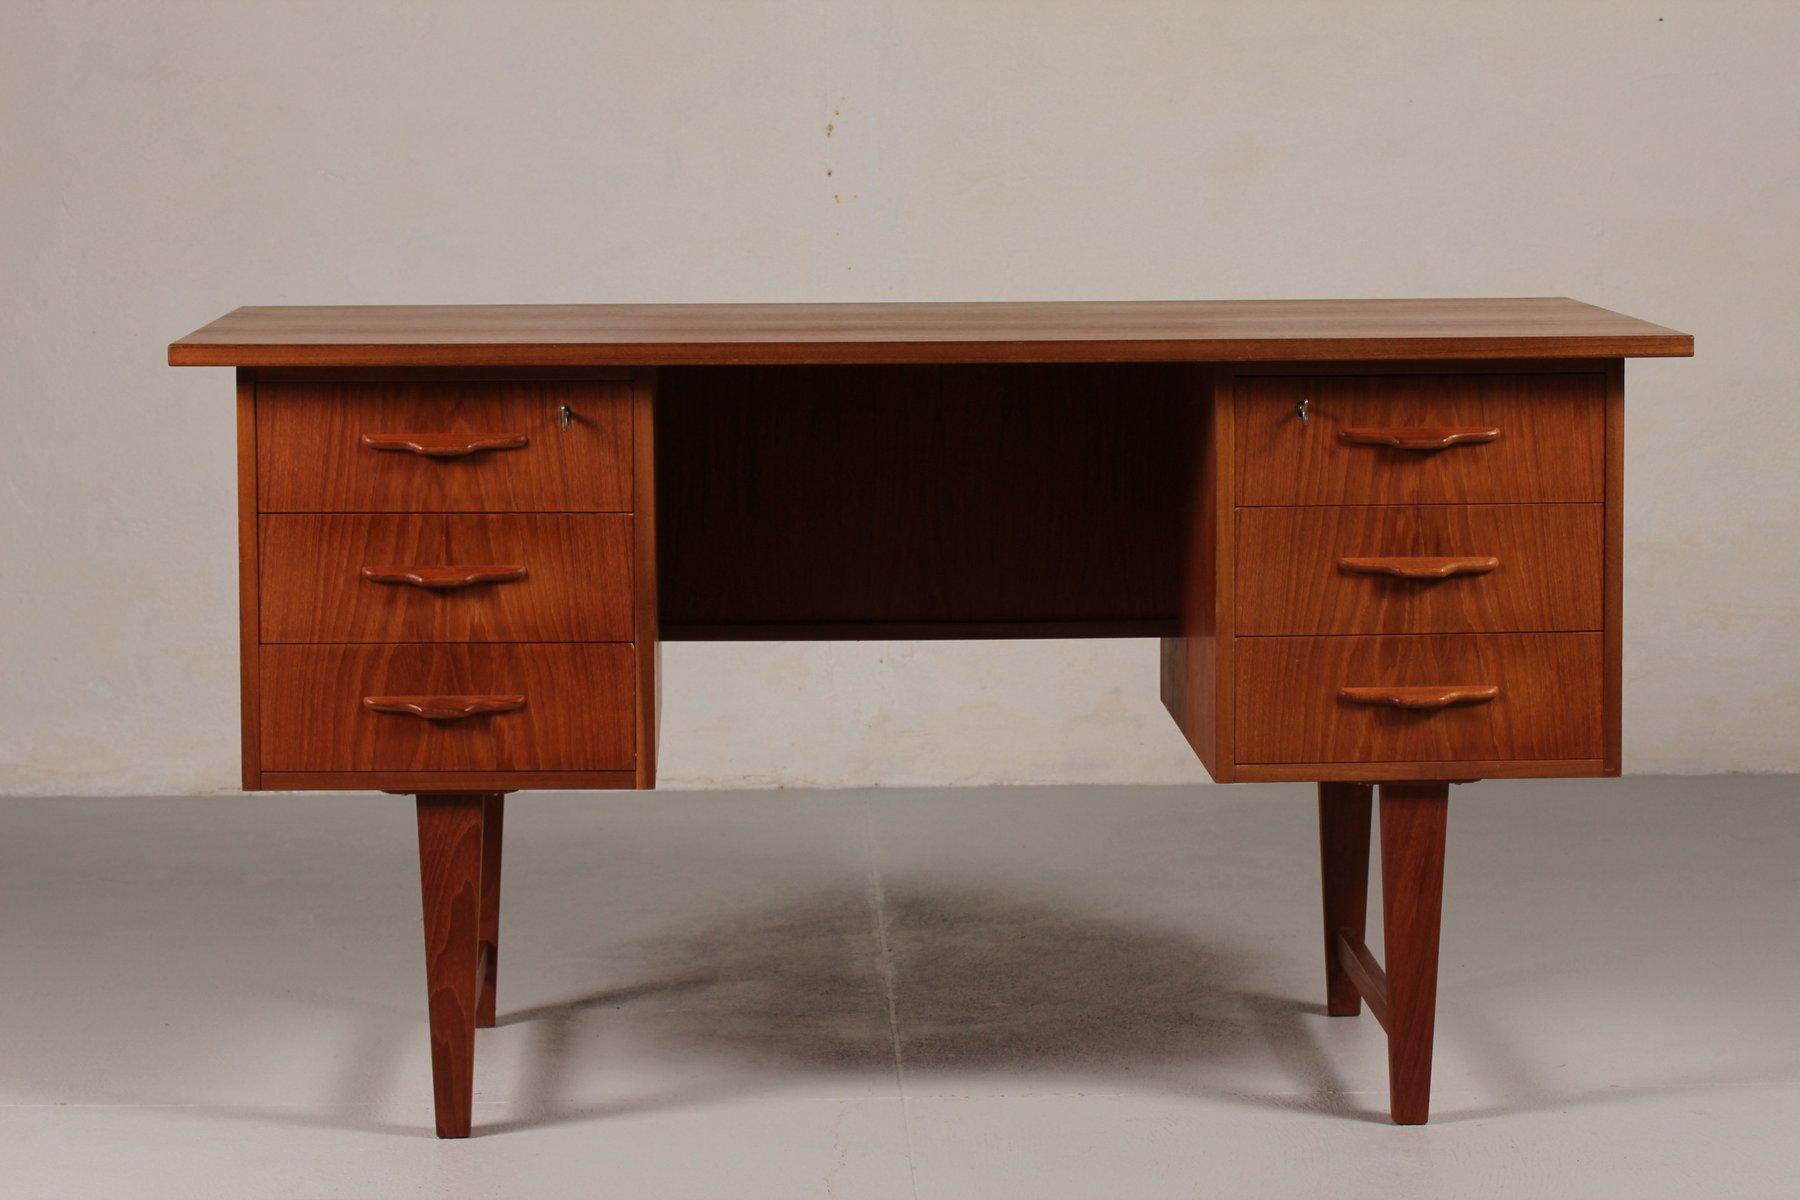 Danish Mid Century Teak Desk With Six Drawers 1960s For